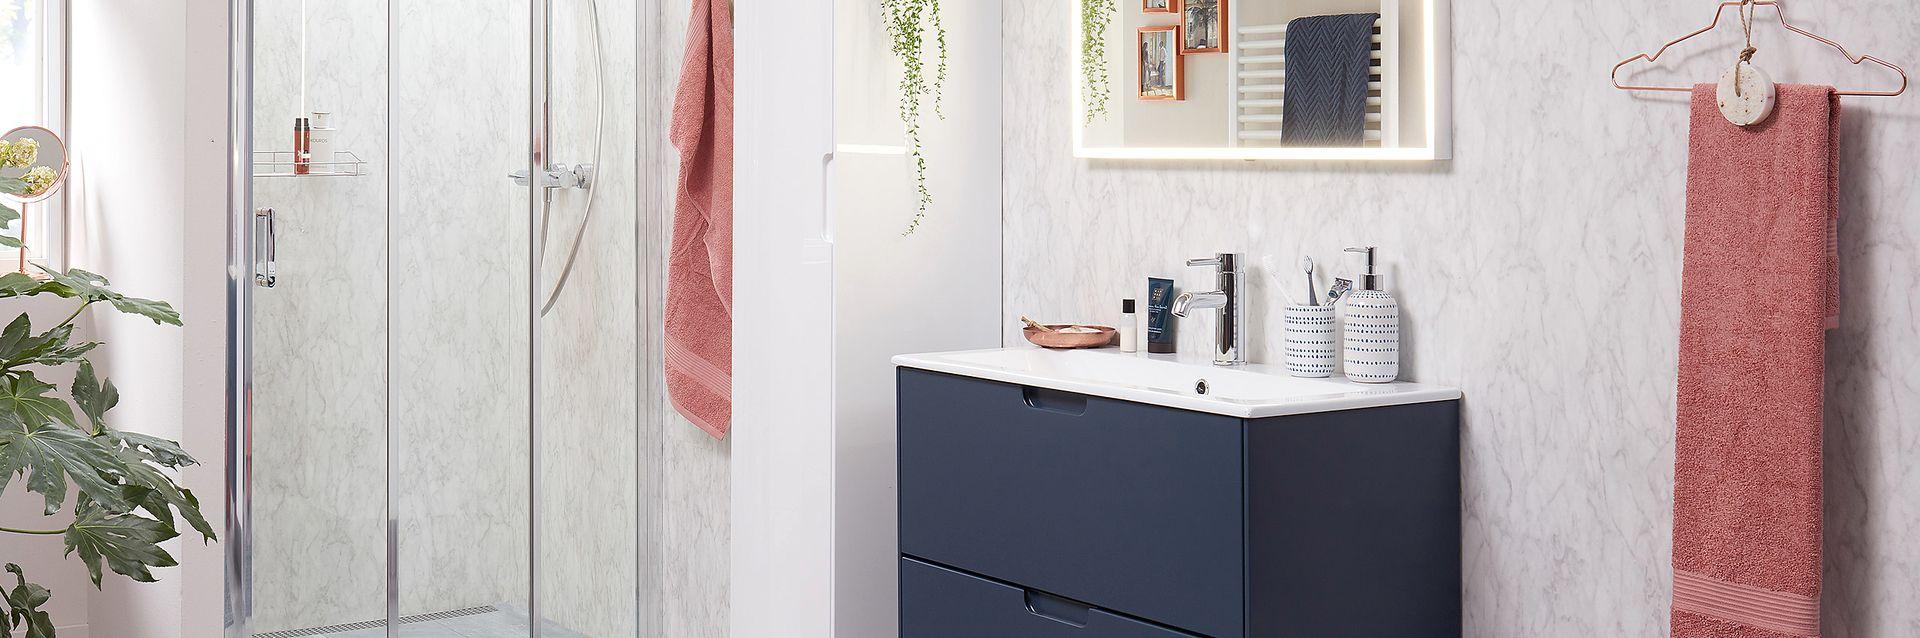 Wastafel kleine badkamer slimme oplossingen - ruime keuze - Hamer ...